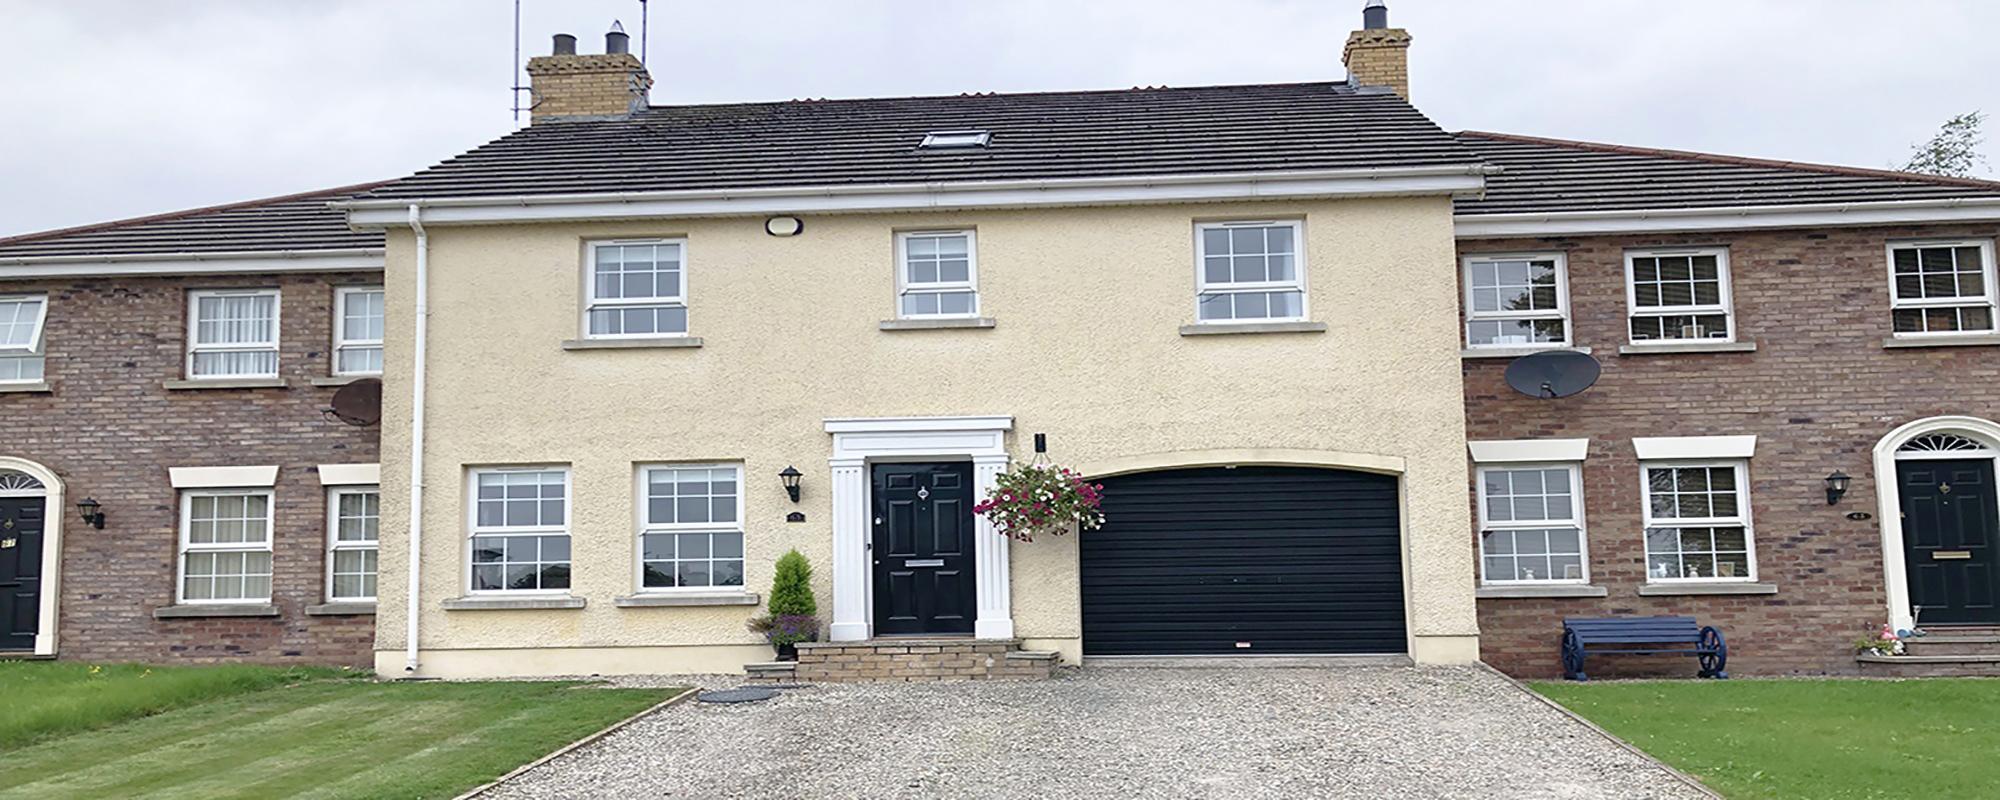 65 Summerhill Brae, Banbridge, BT32 3LS